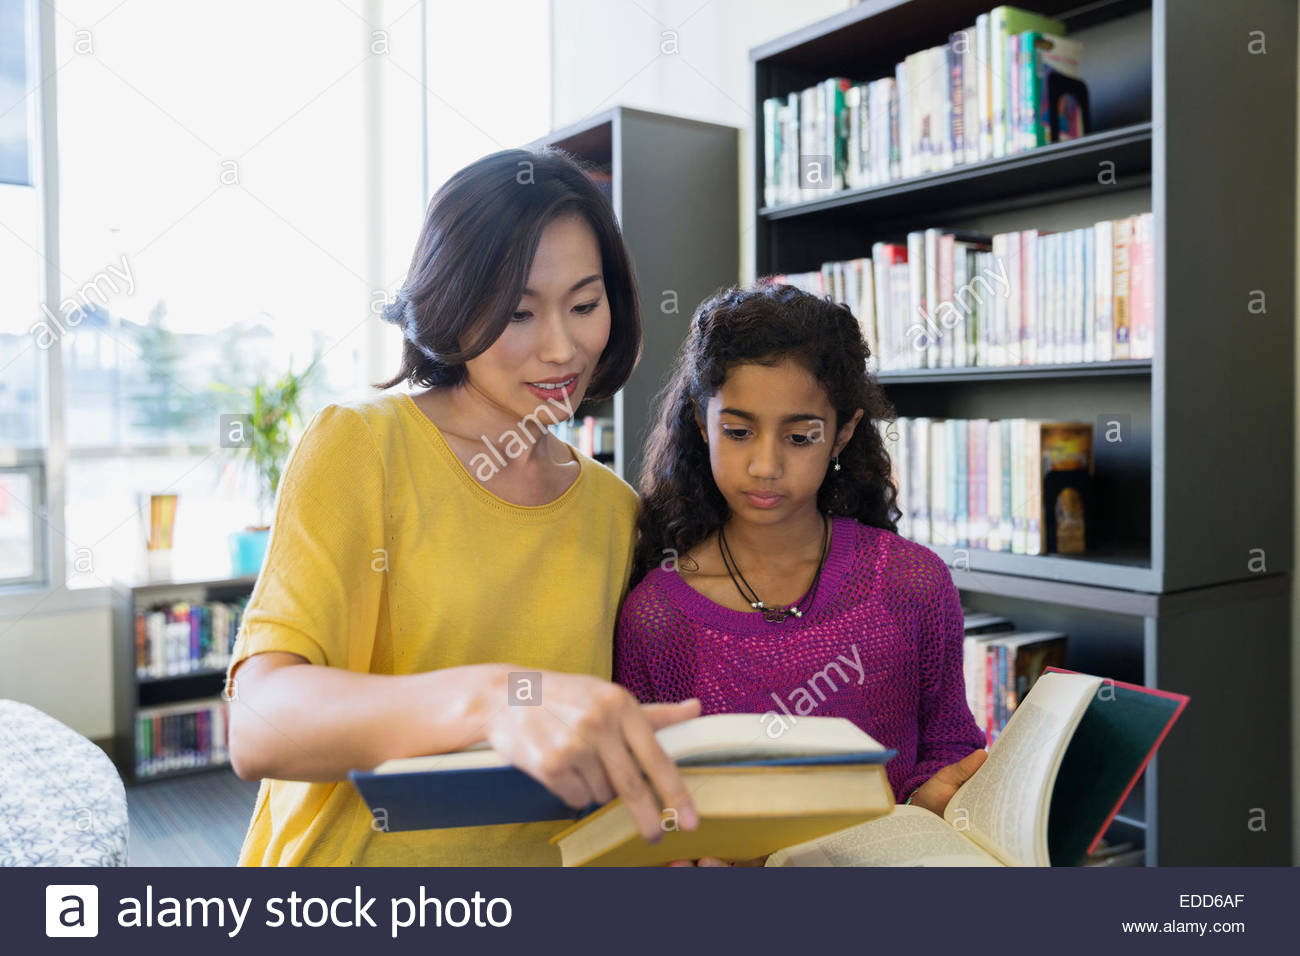 30 Best Books for Elementary Readers | Education.com